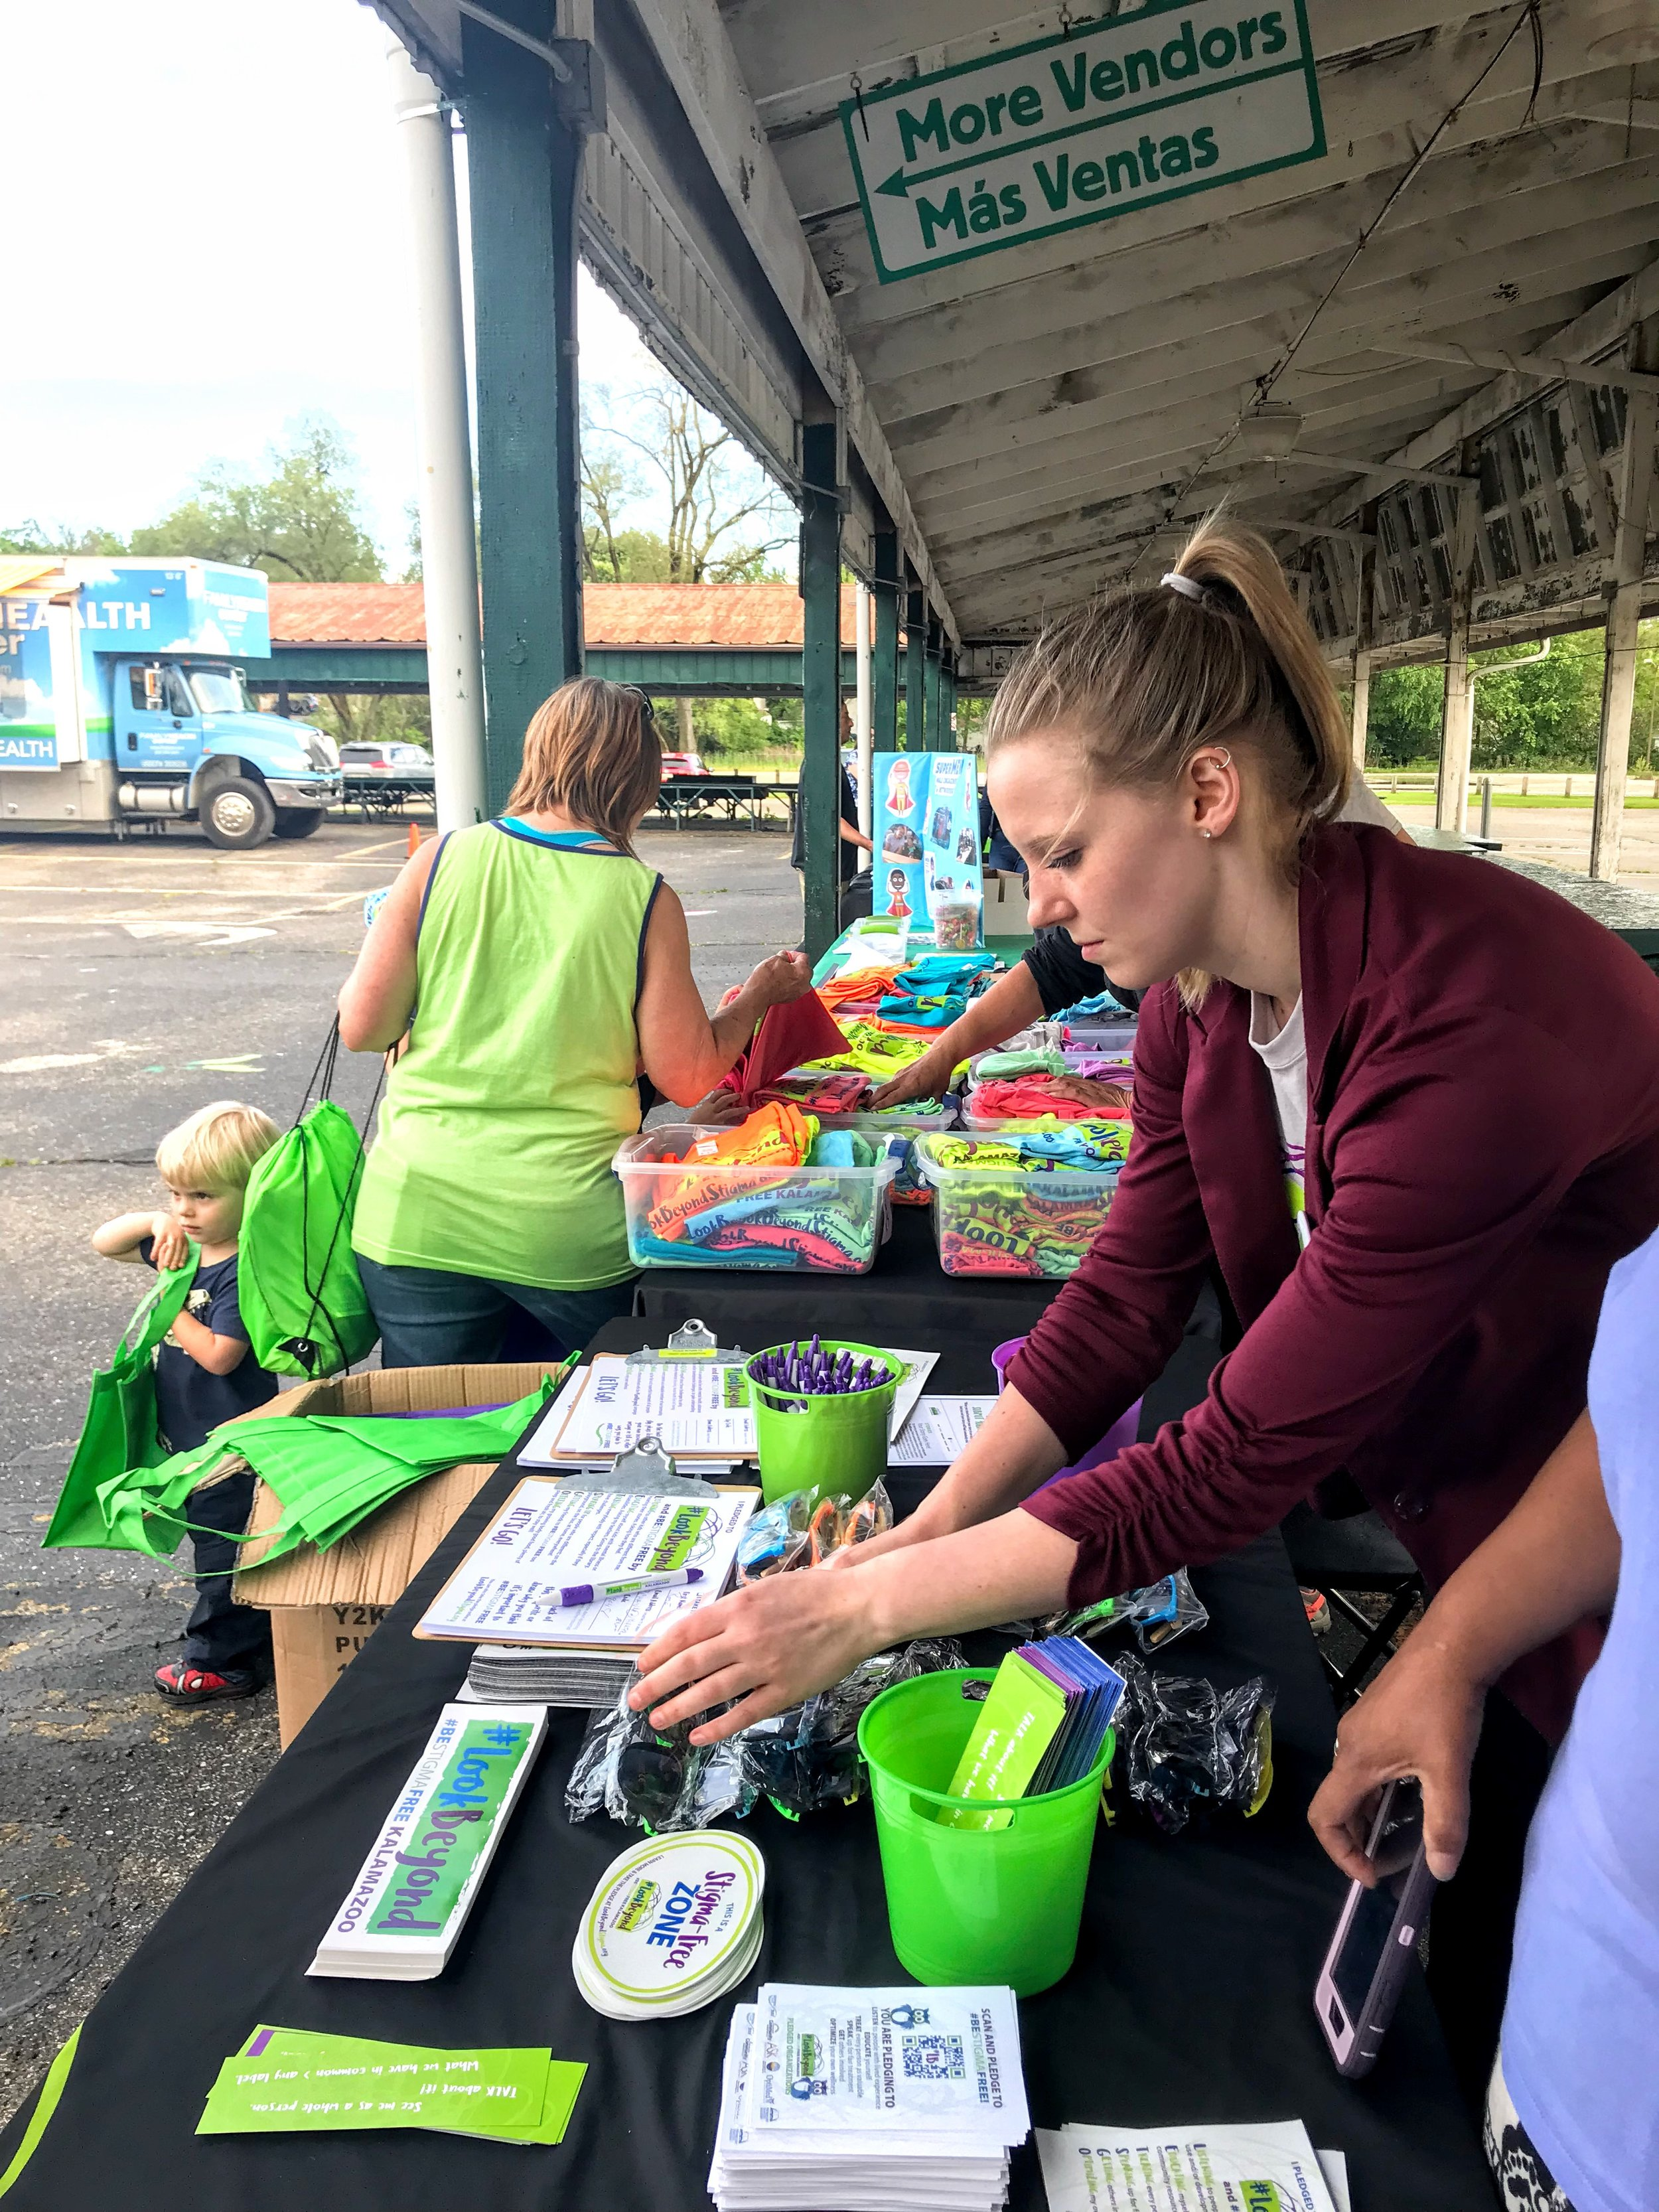 Repping #LookBeyond during the Kalamazoo RESA Head Start Family Resource Night at Bank Street Farmers Market.